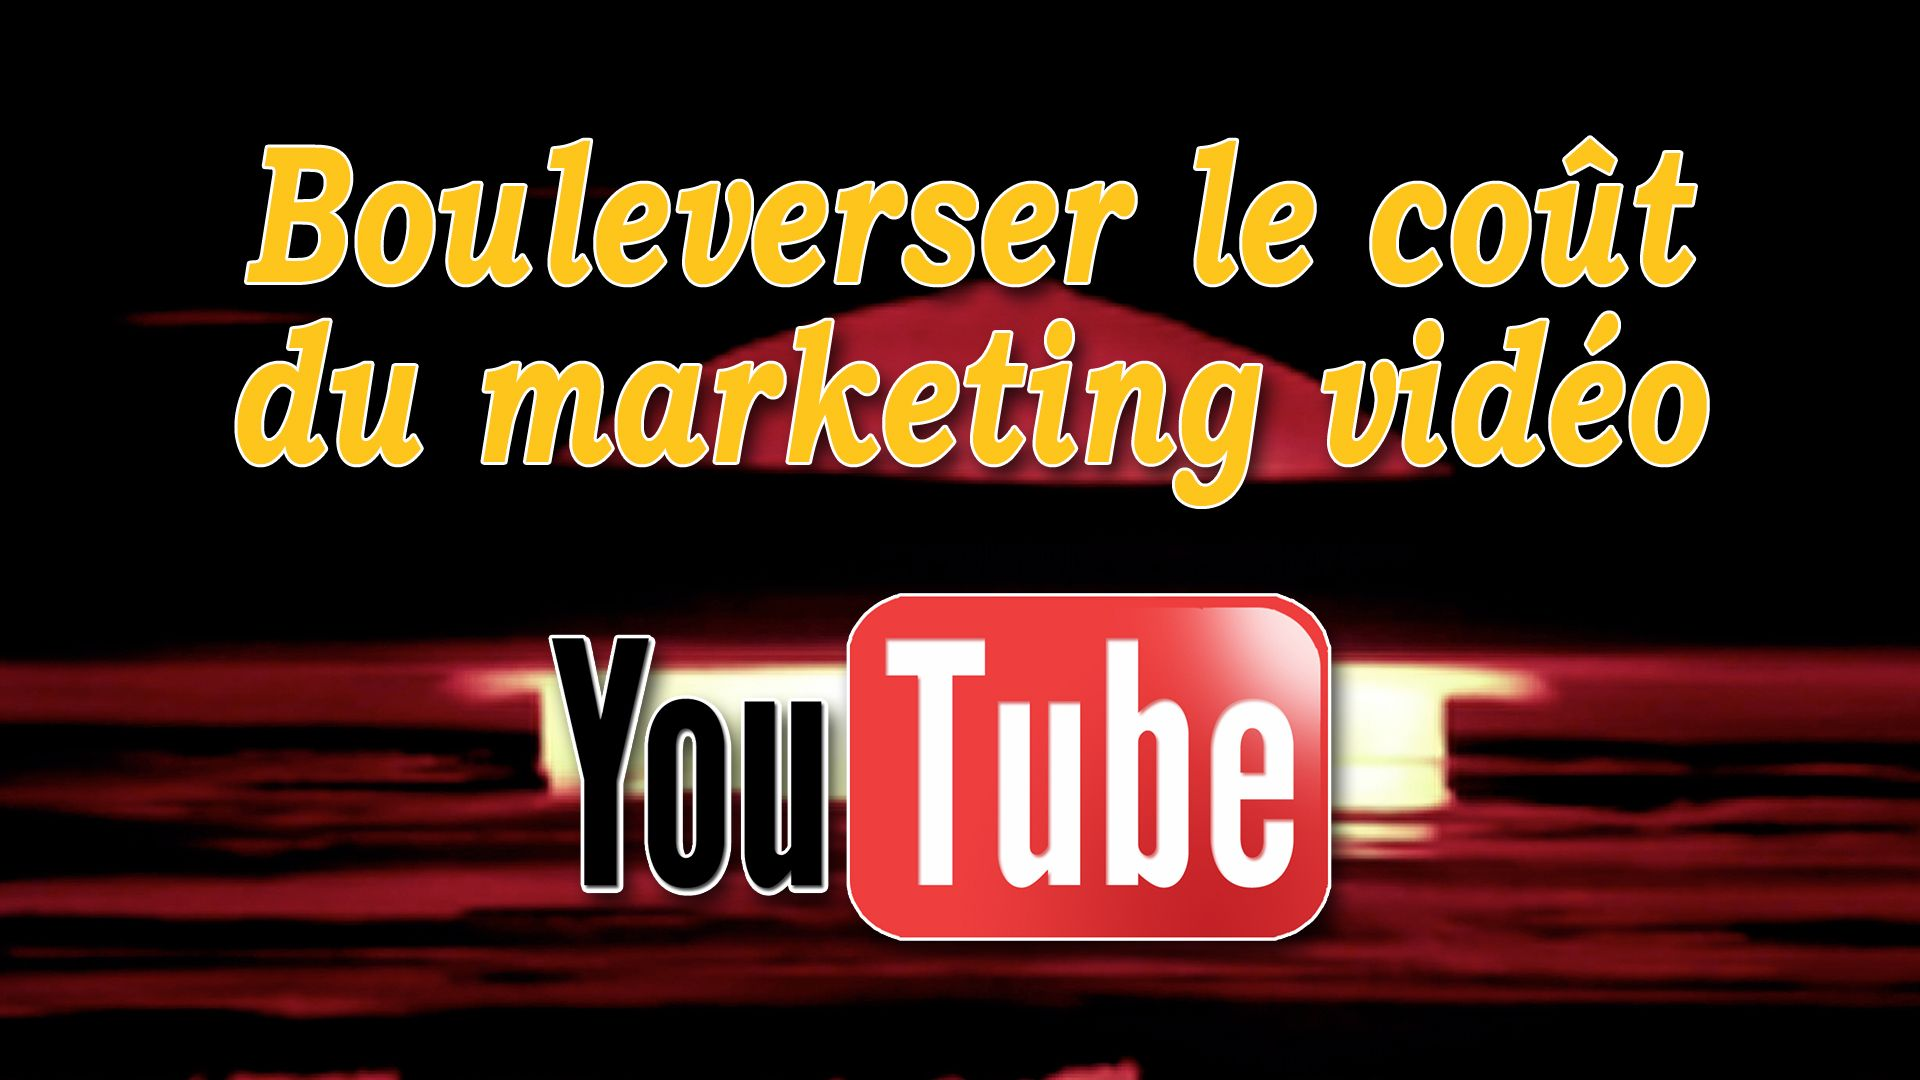 Bouleverser le coût du marketing vidéo sur YouTube #GrowthHacking #WebMarketing #FormationGrowthHacking #CentreDeFormationFrance #TunnelAARRR #AARRR #SocialMedia #CommunityManagement #SEO #MarketingDigital #SiteWeb #youtube